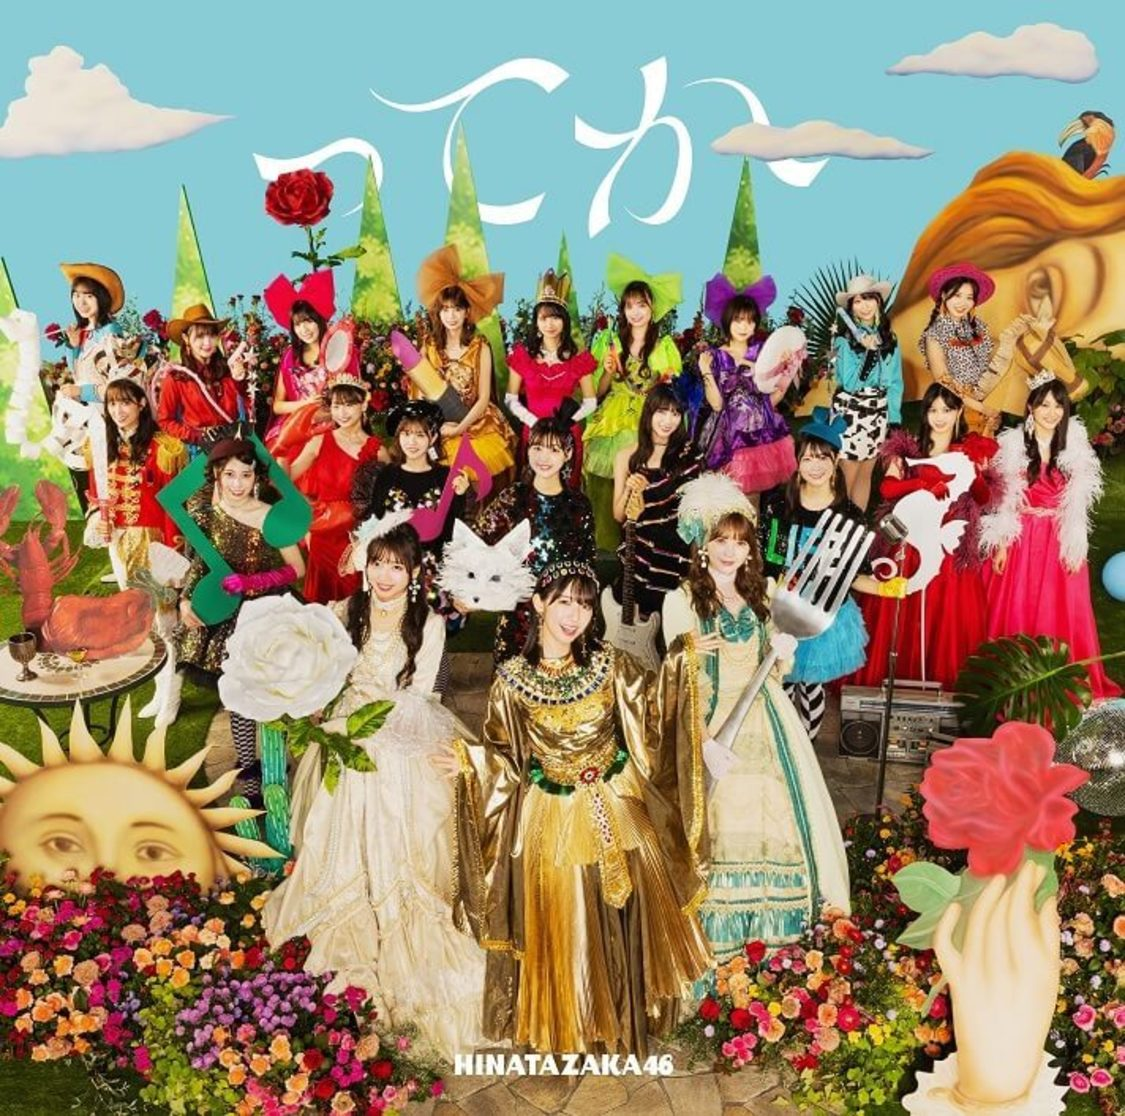 6thシングル「ってか」初回仕様限定盤TYPE-A